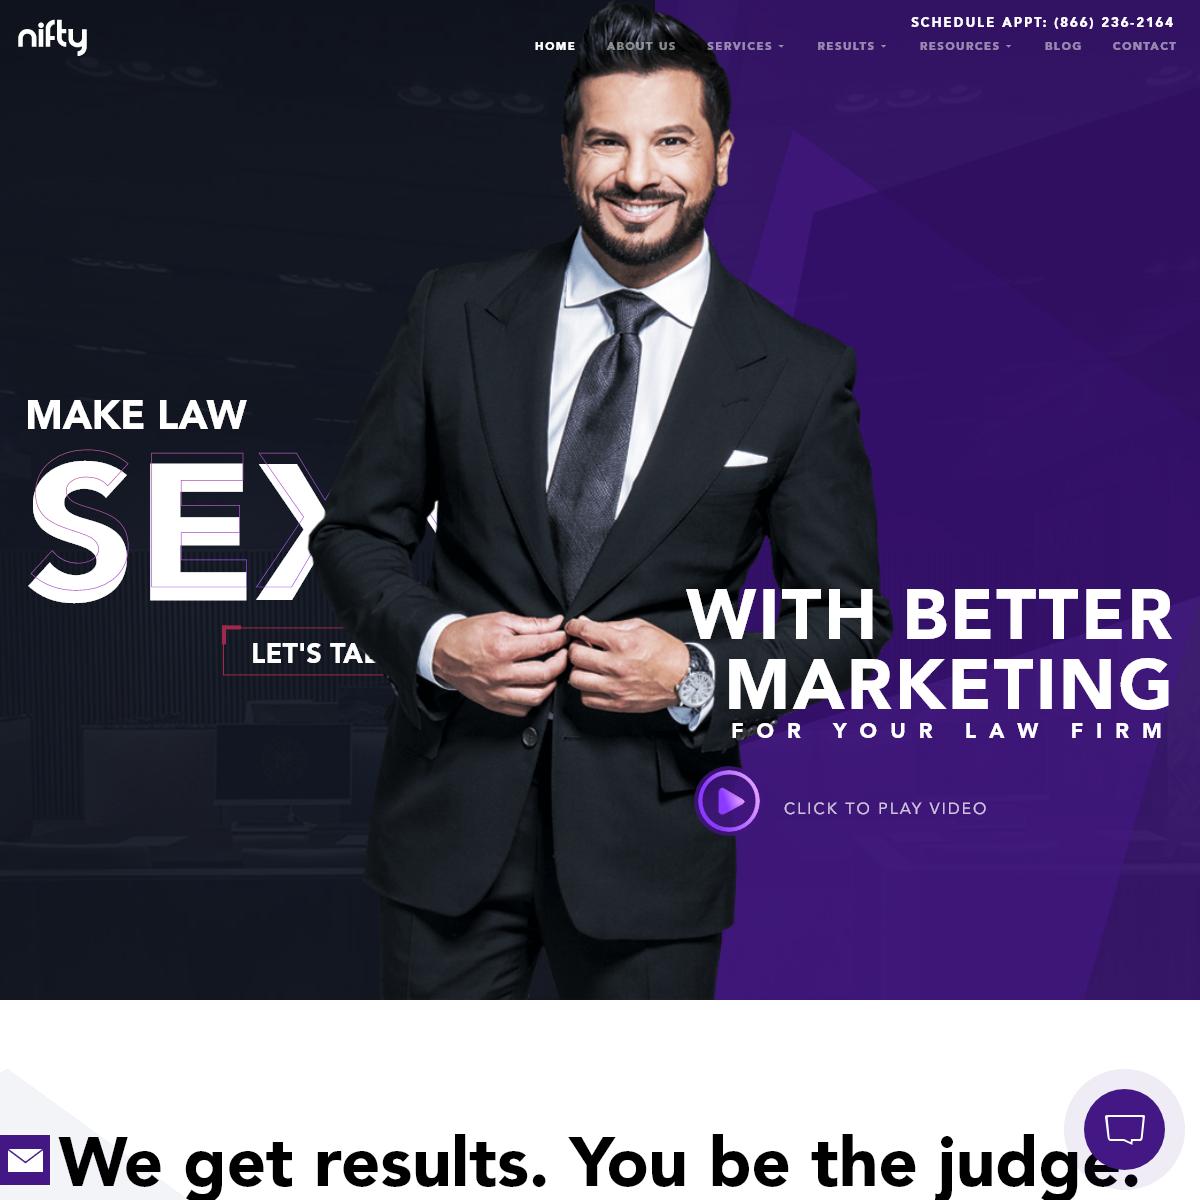 Legal Marketing = SEO + Design + Content + PPC + Social + Video